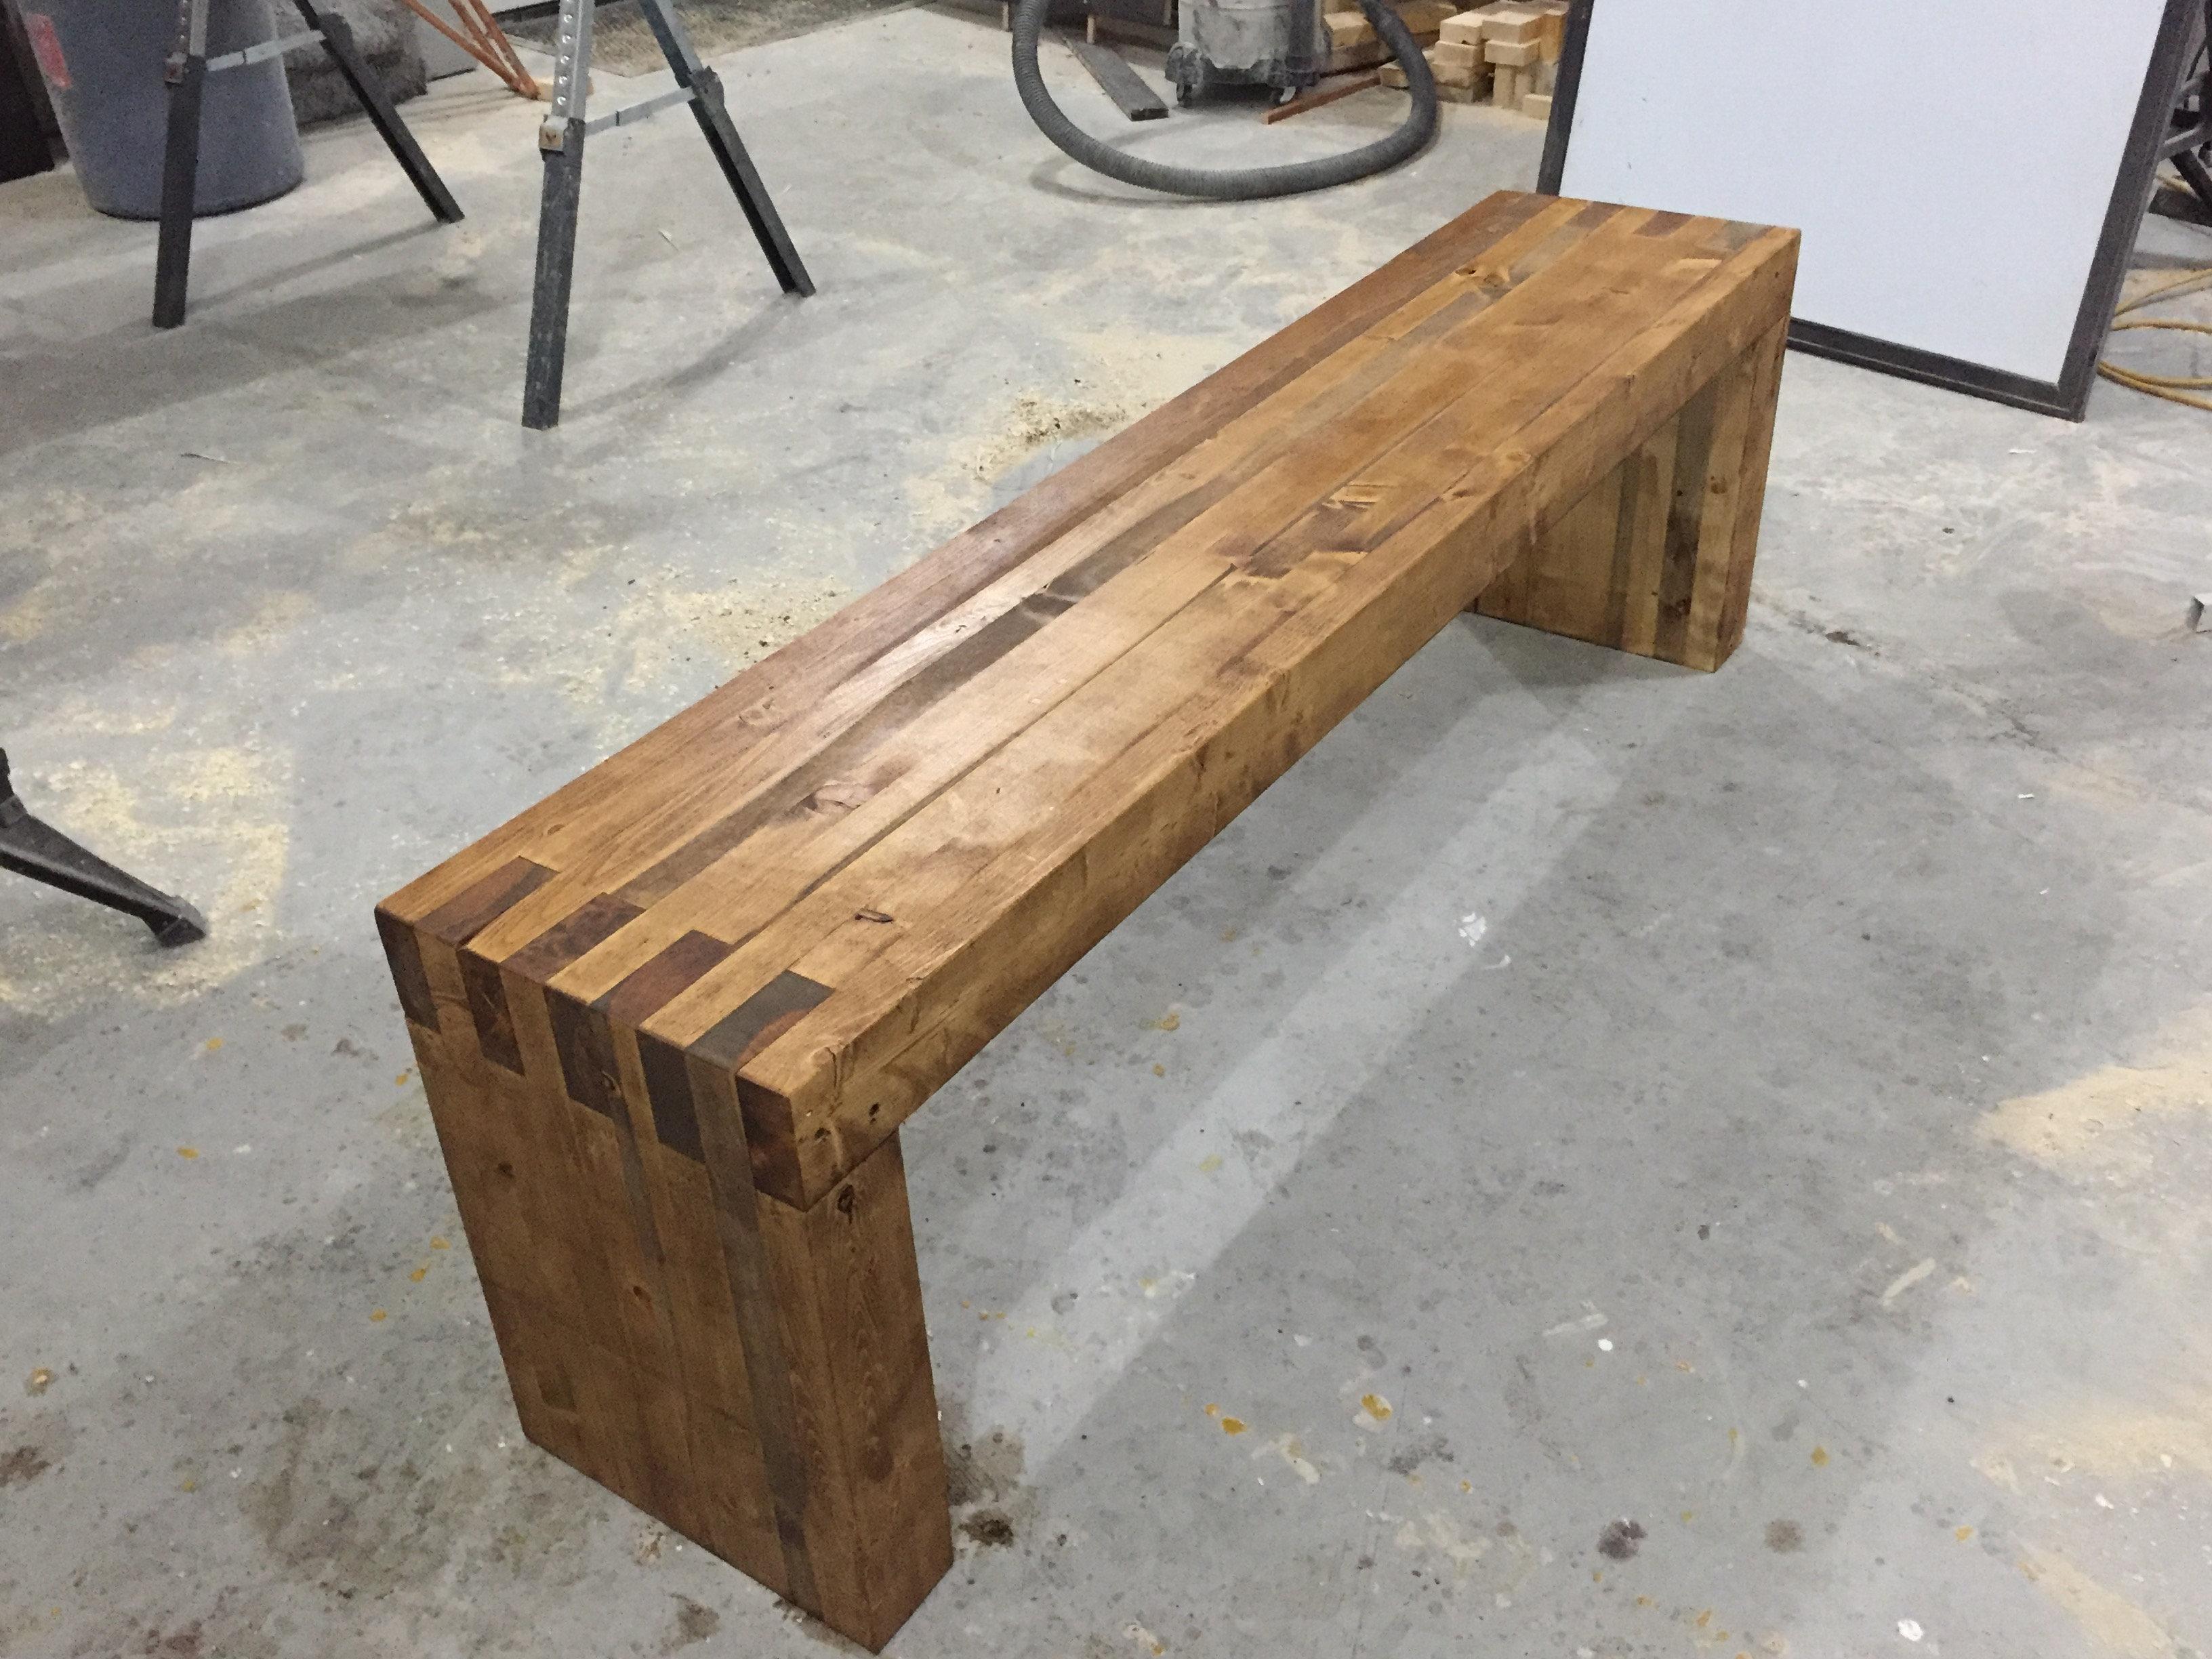 Rustic Solid Wood Bench Website